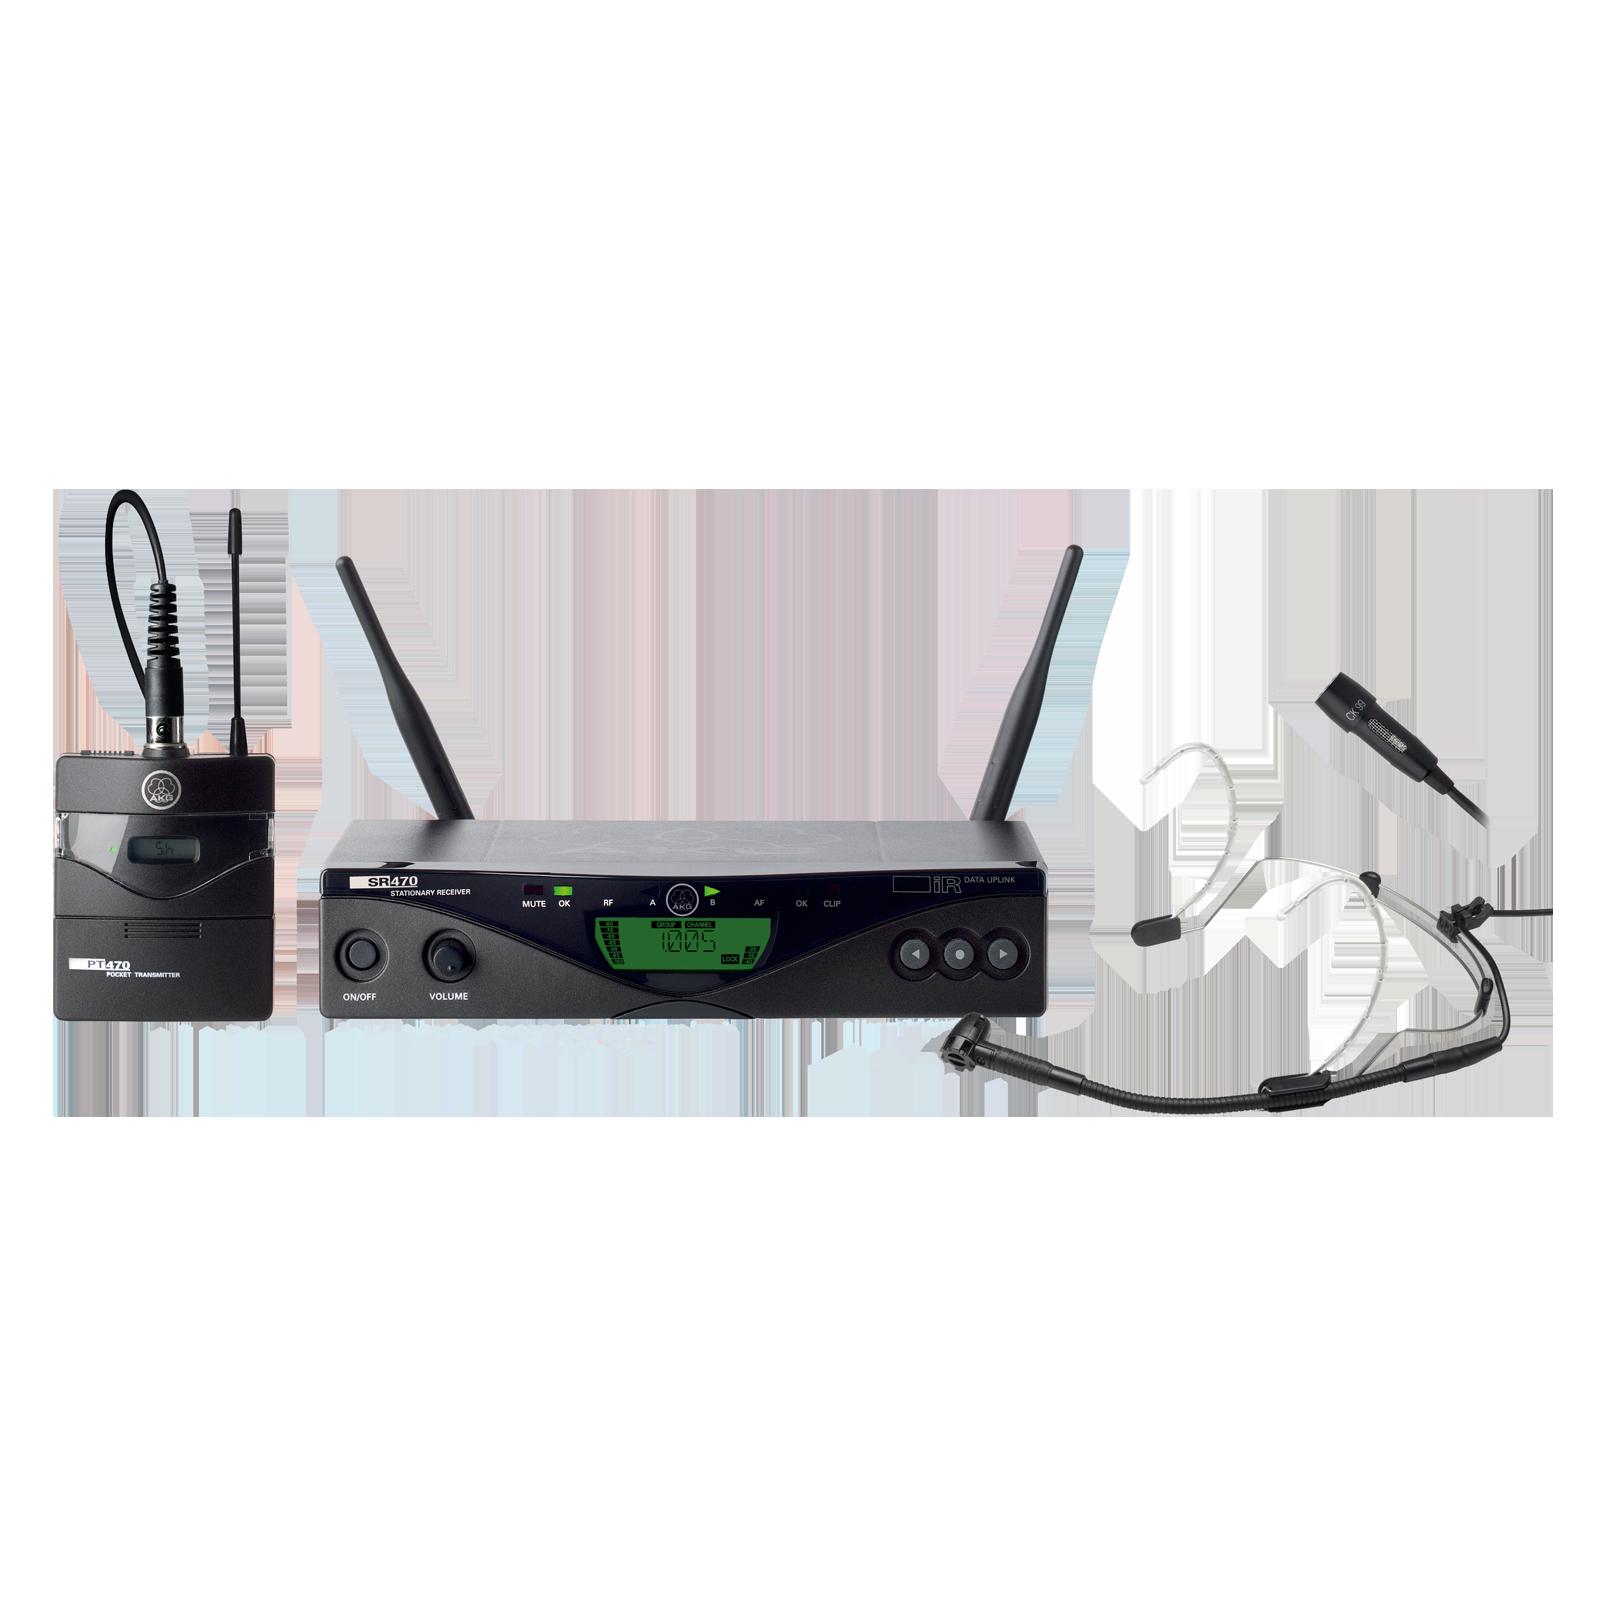 WMS470 Presenter Set - Black - Professional wireless microphone system - Hero